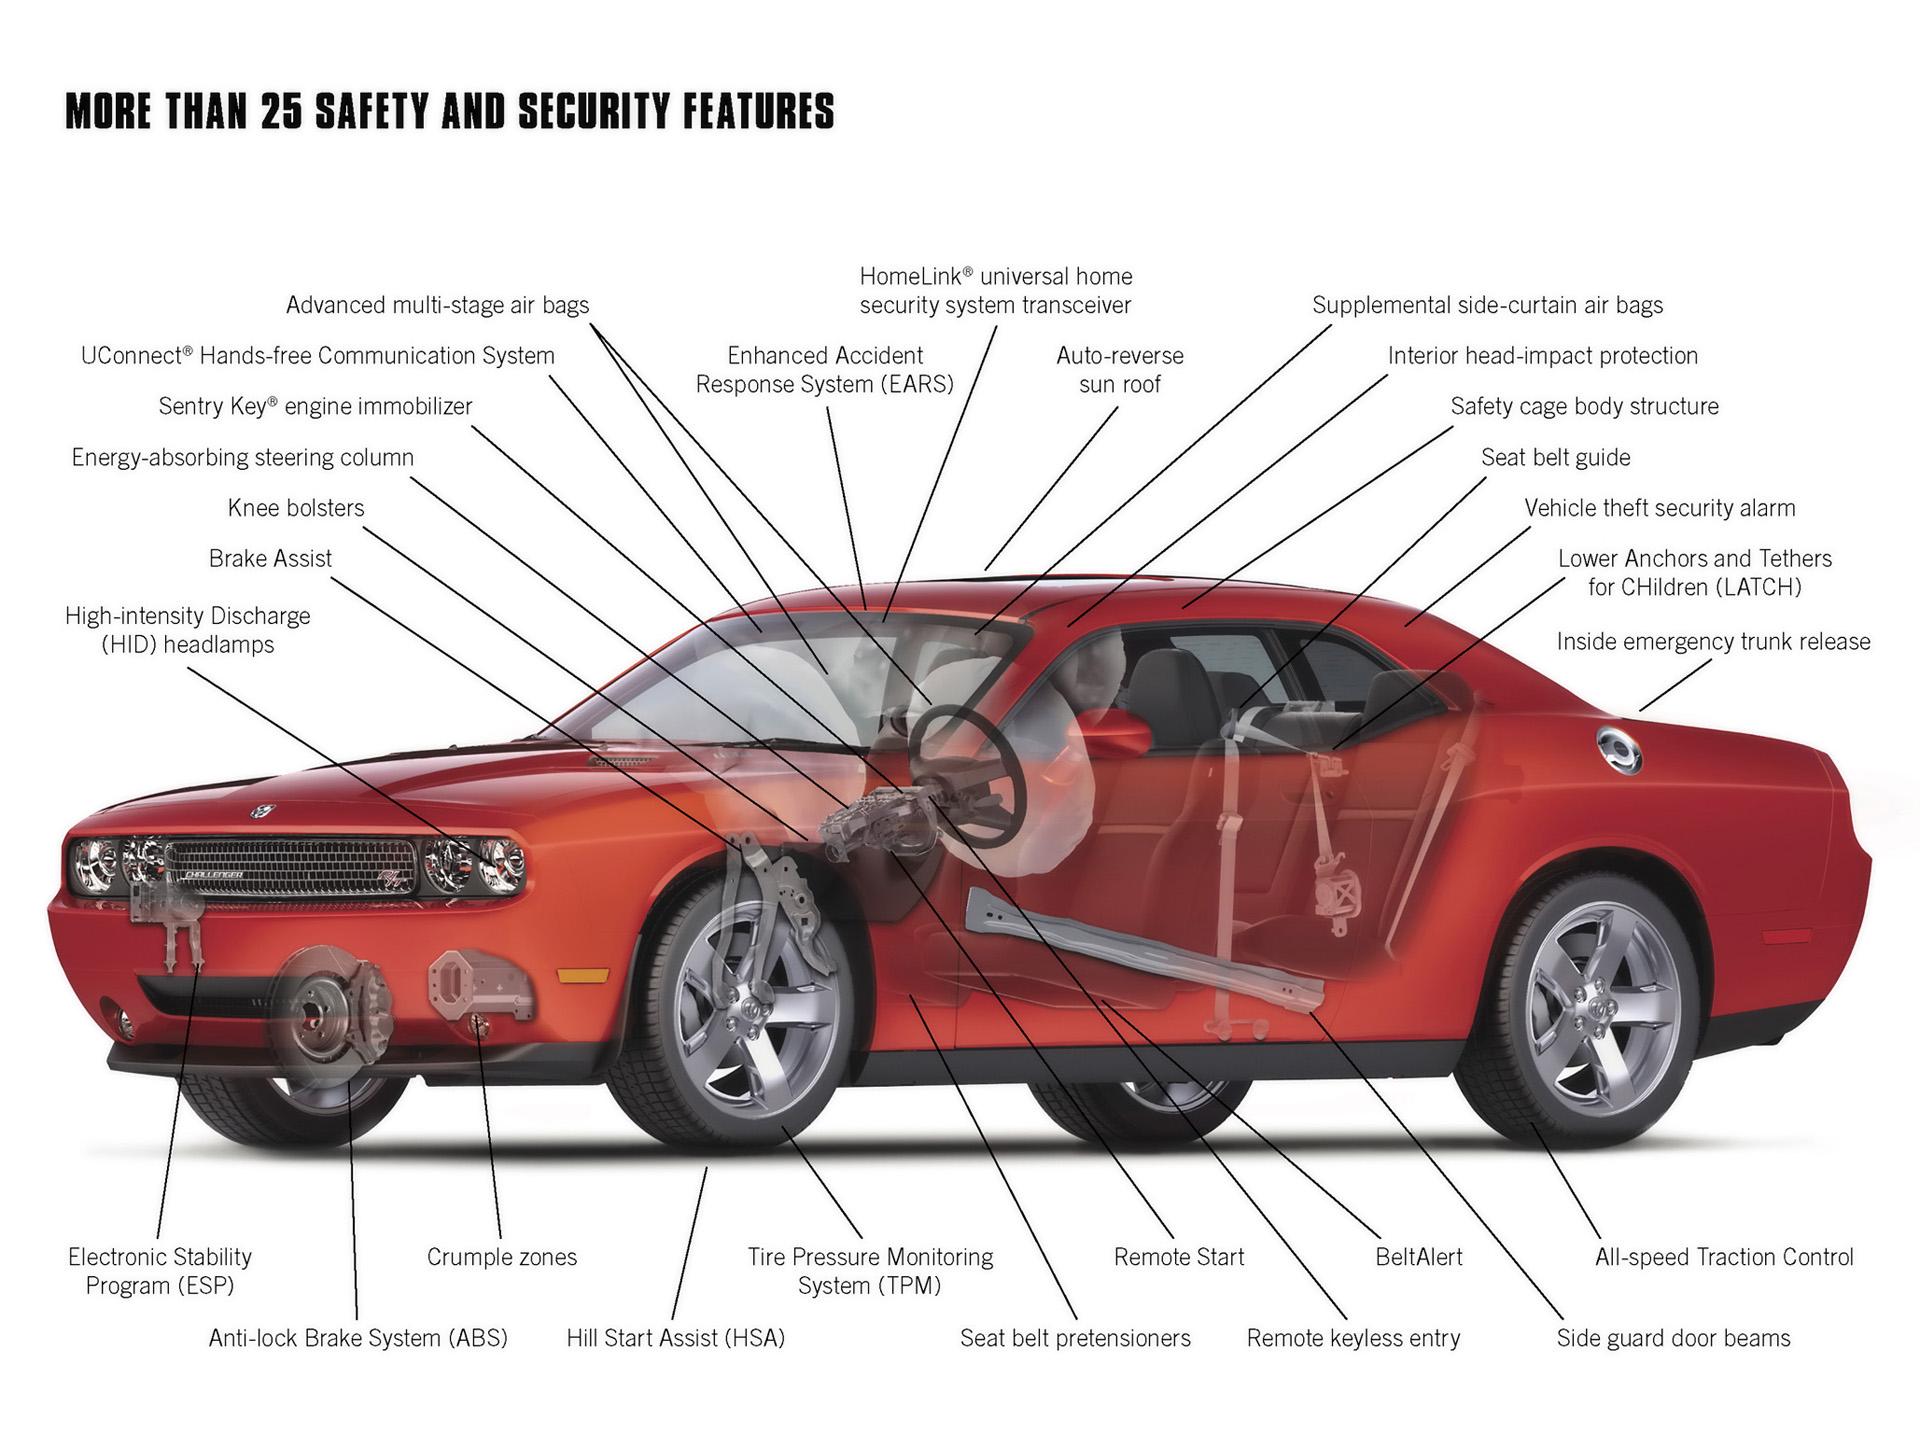 hight resolution of 2009 dodge challenger rt safety diagram 1920x1440 jpg